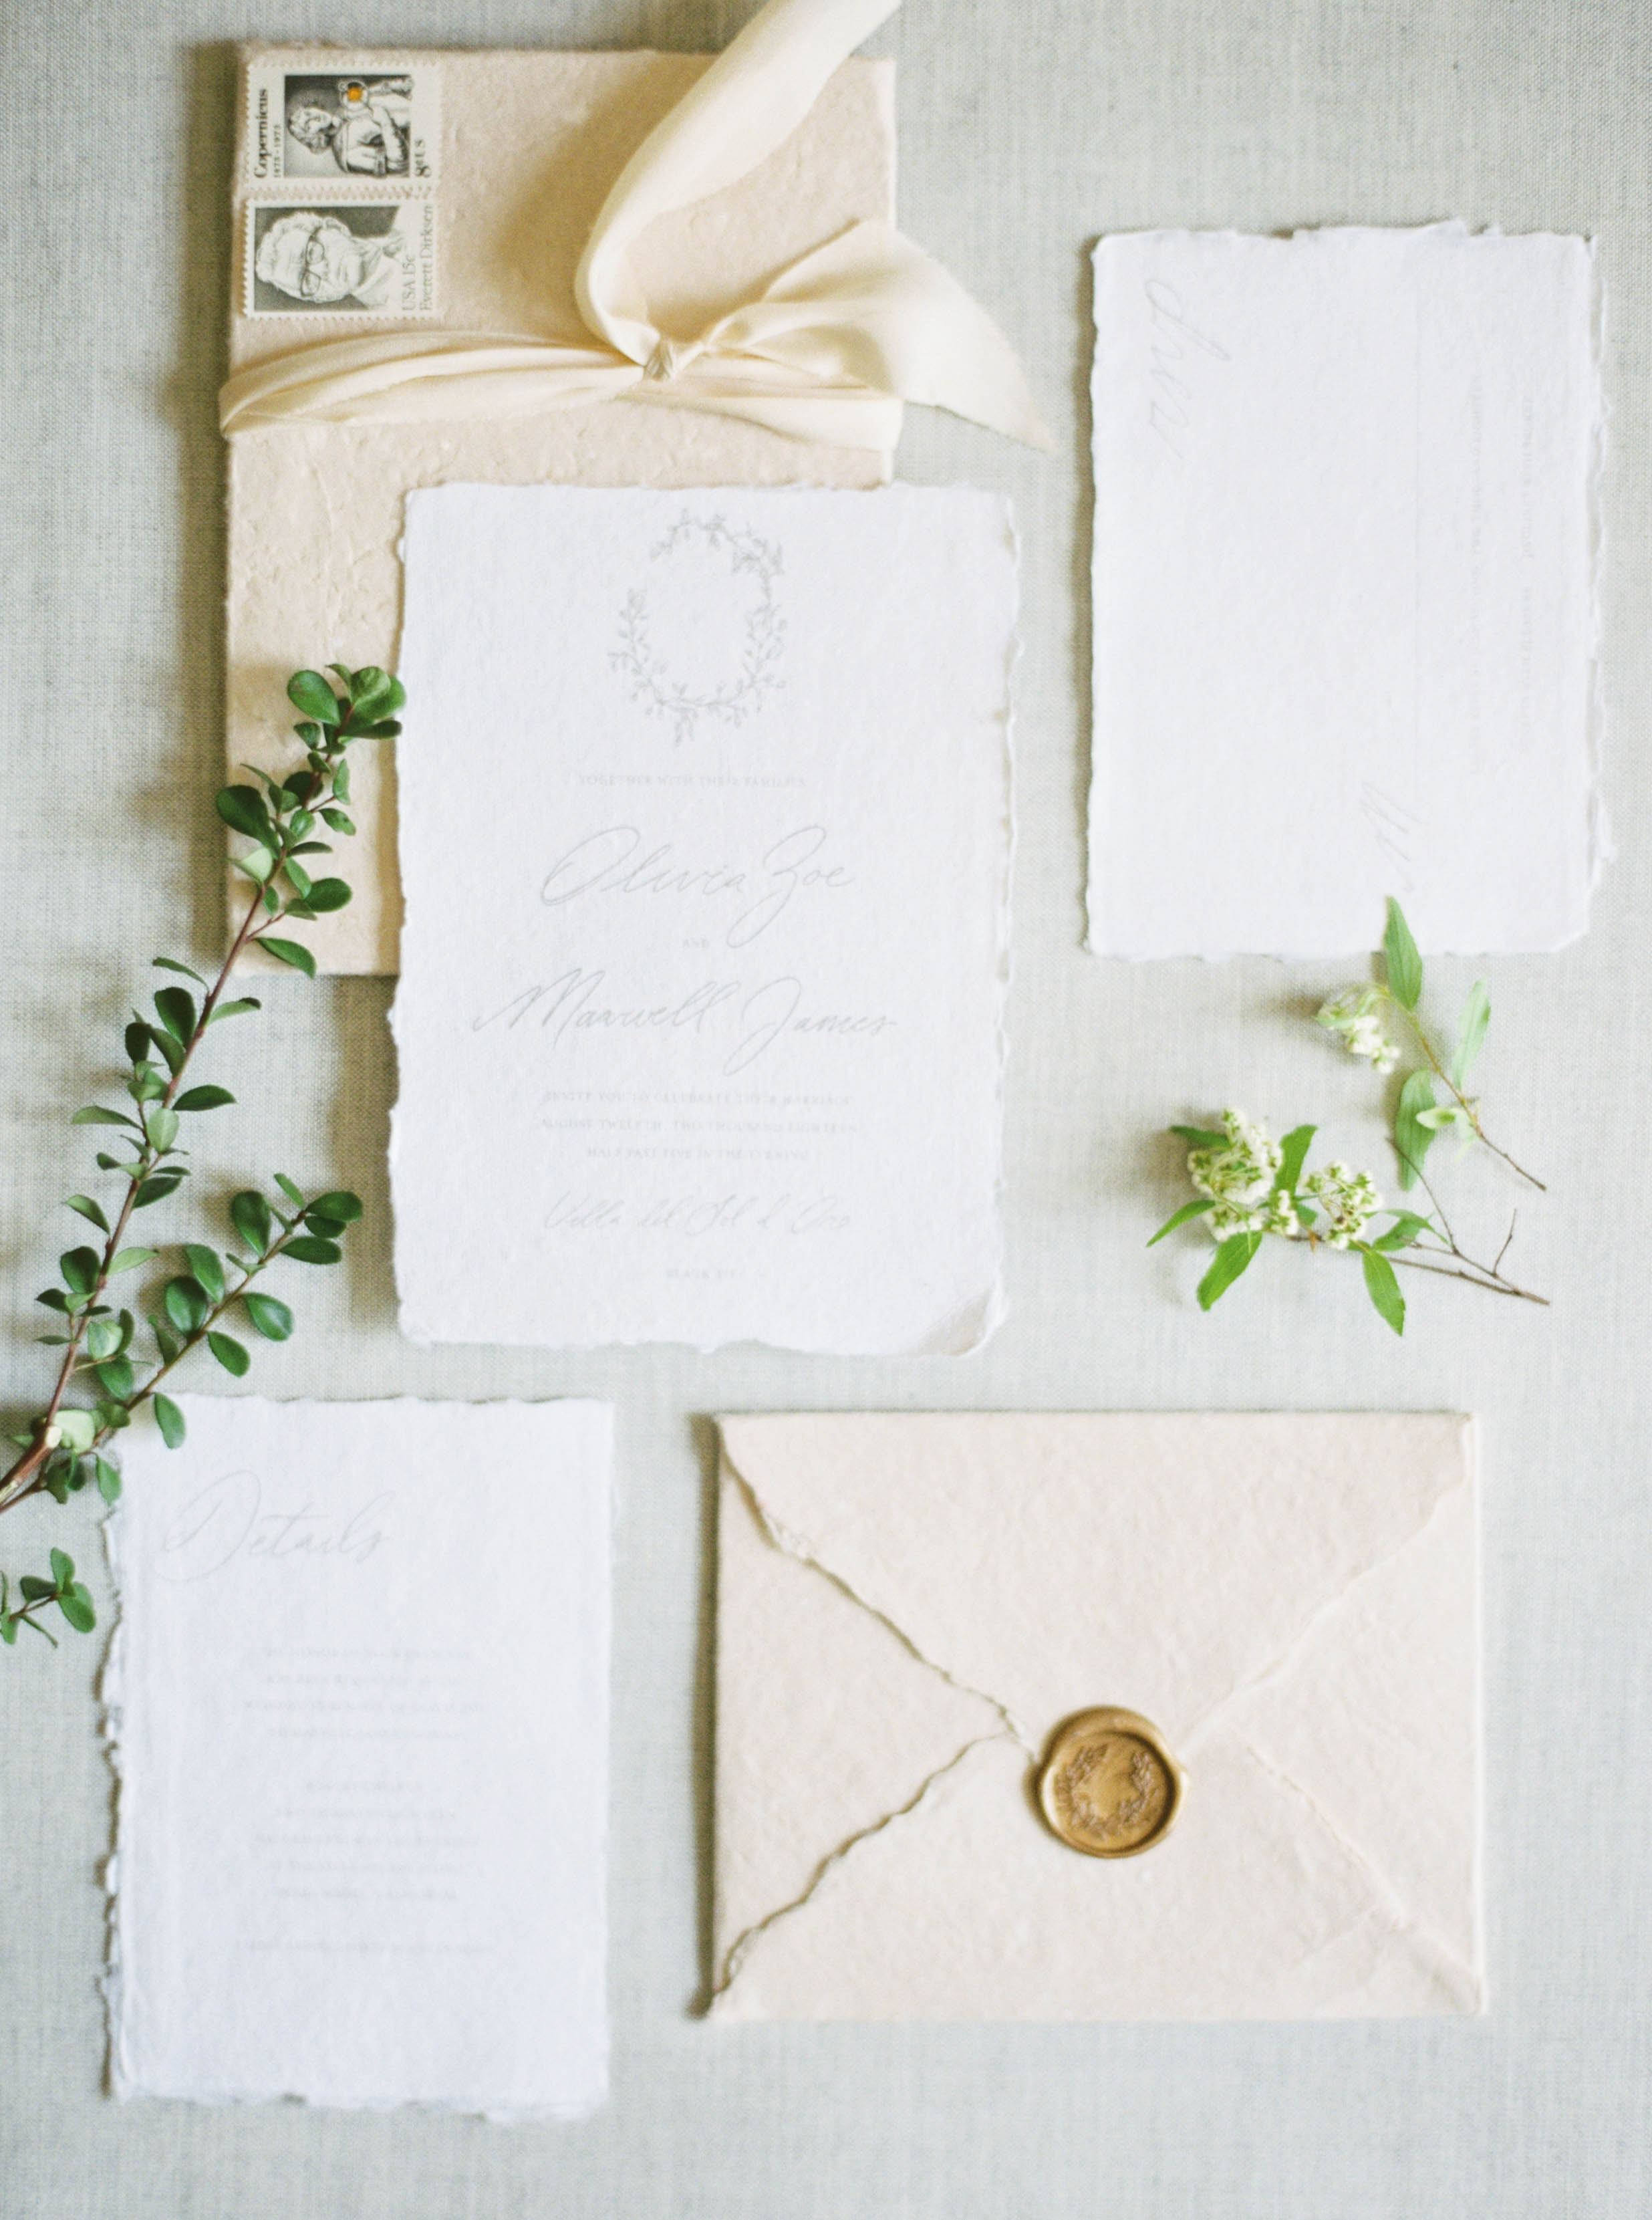 ink&pressco-mikylamanu-wedding-calligraphy-8-unearthing.tc.jpg